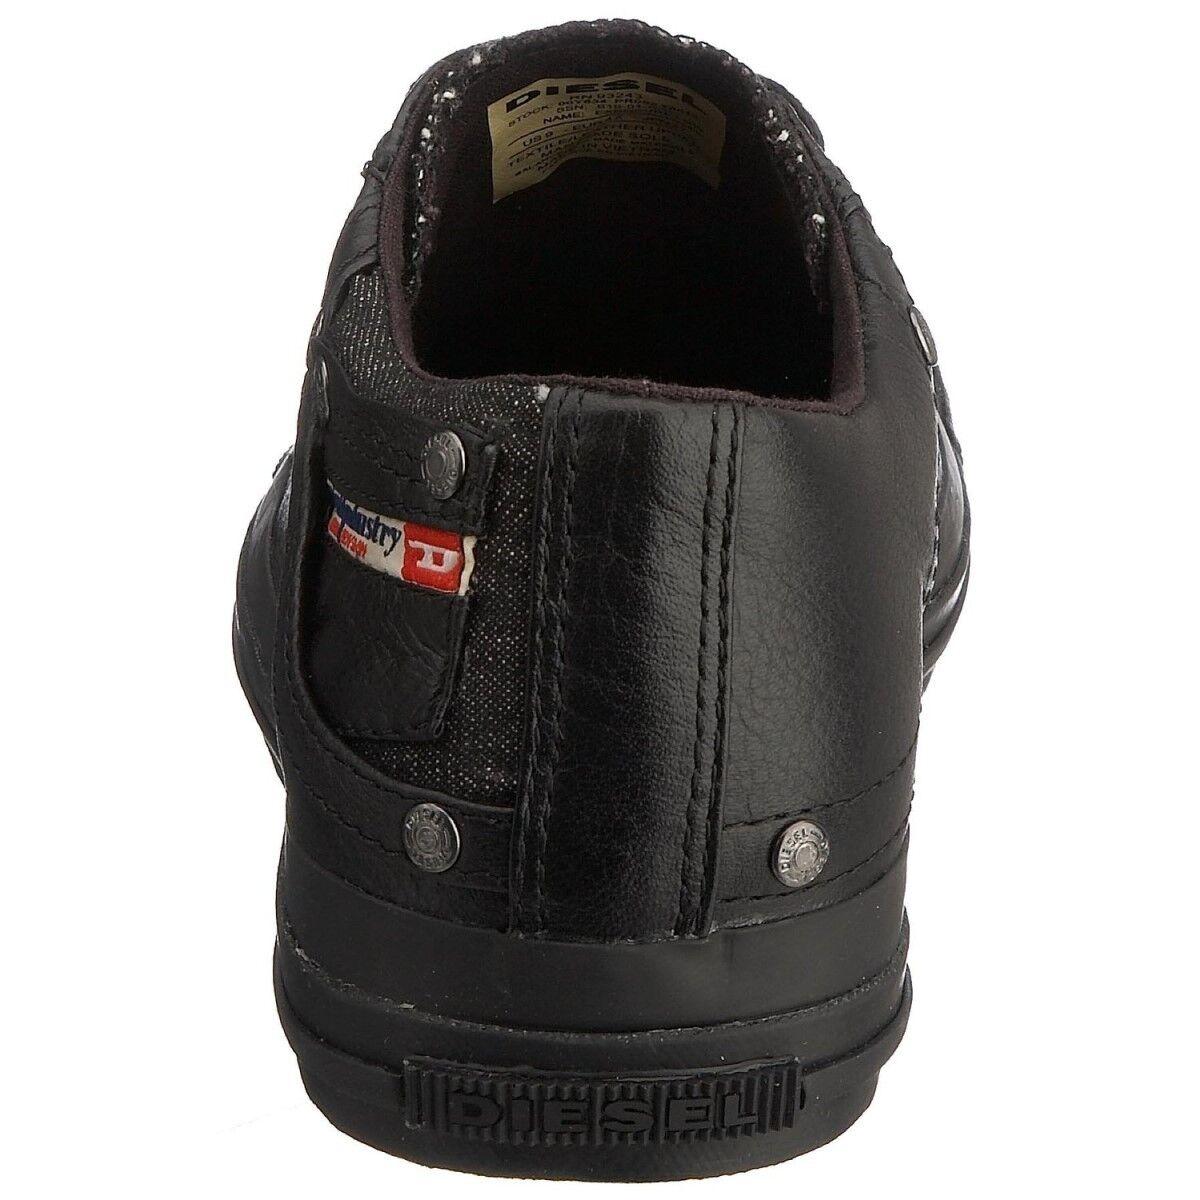 Diesel Exposure Low Top Herren Leder Sneaker Chucks Sport Schuhe Turnschuhe